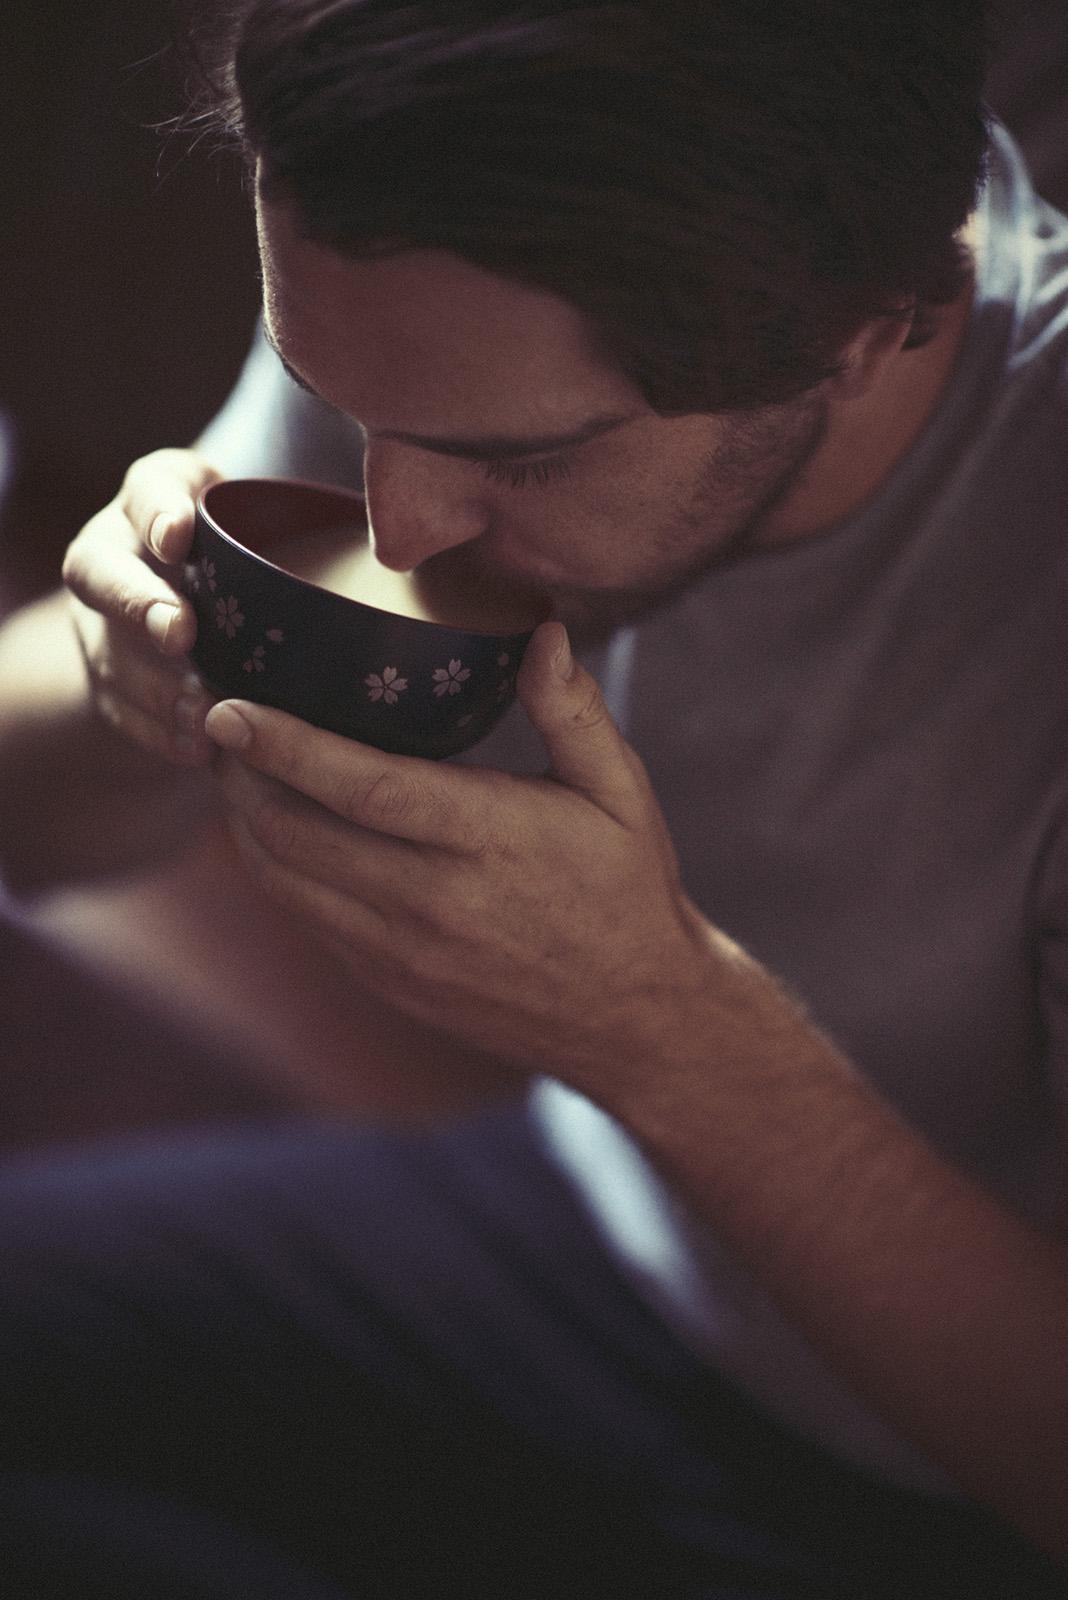 drinking kava in nz.jpg